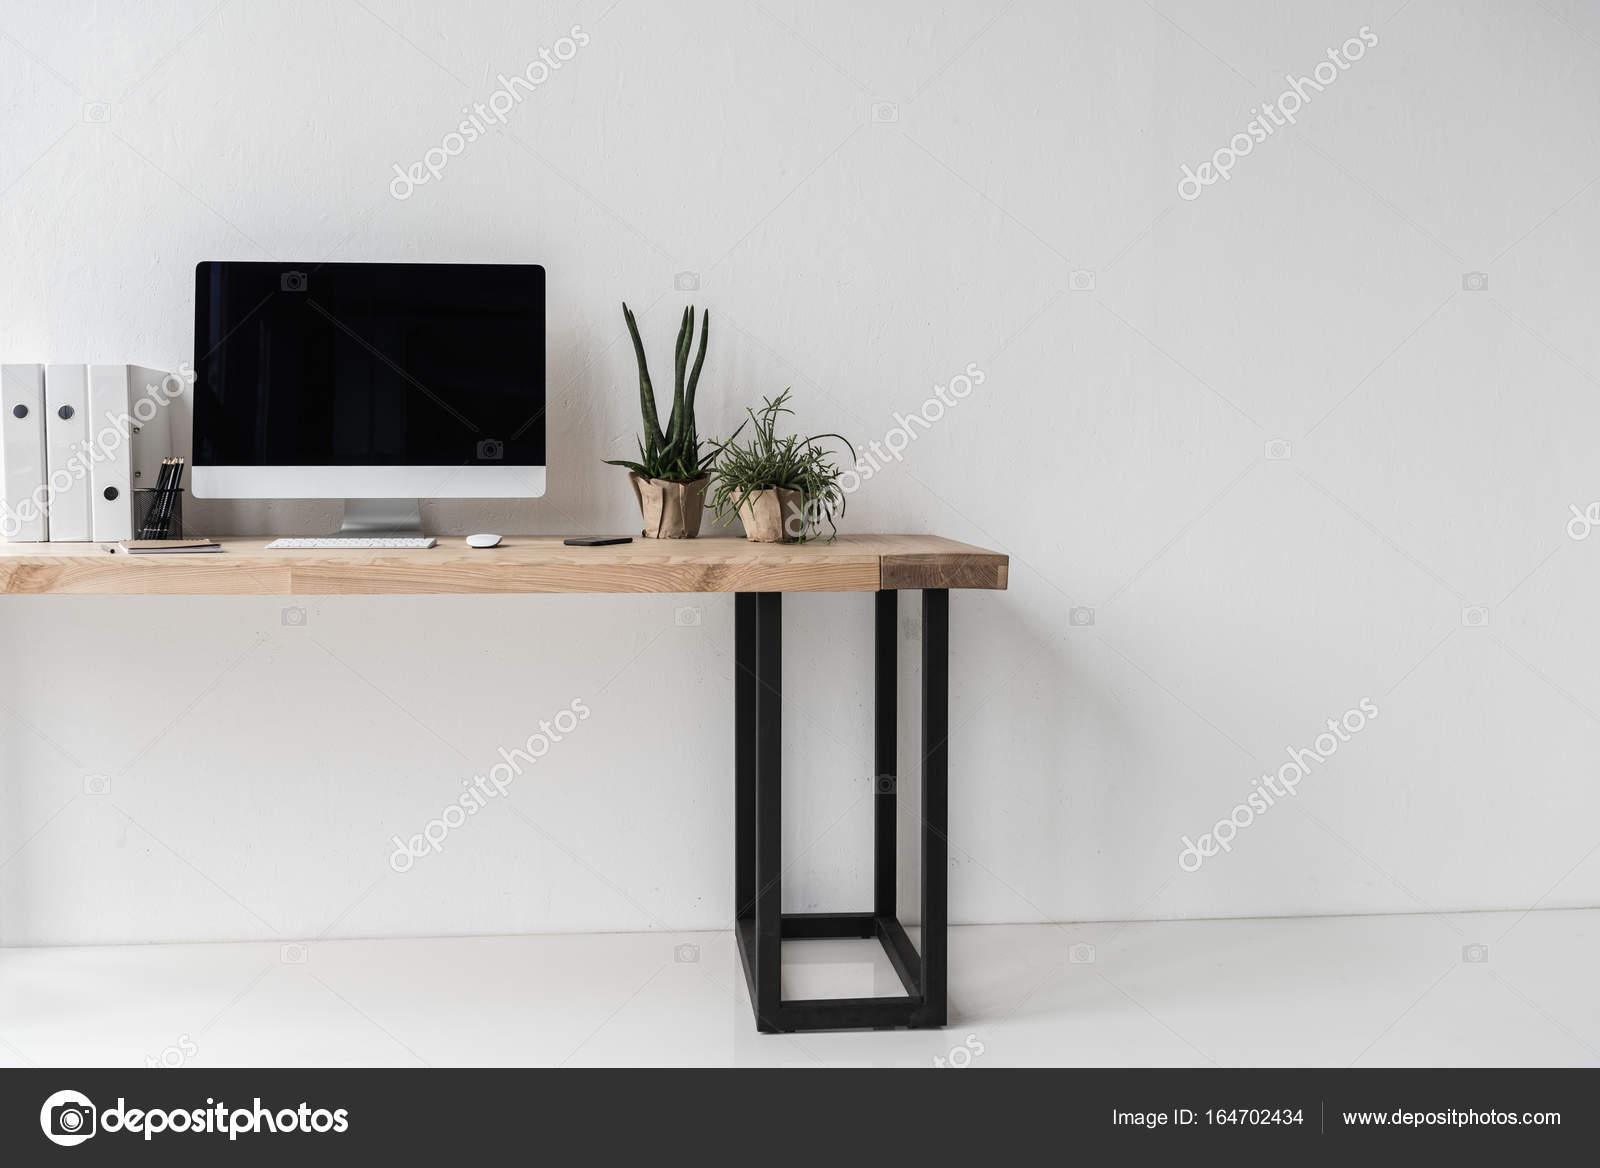 Lieu de travail avec ordinateur de bureau moderne u photographie